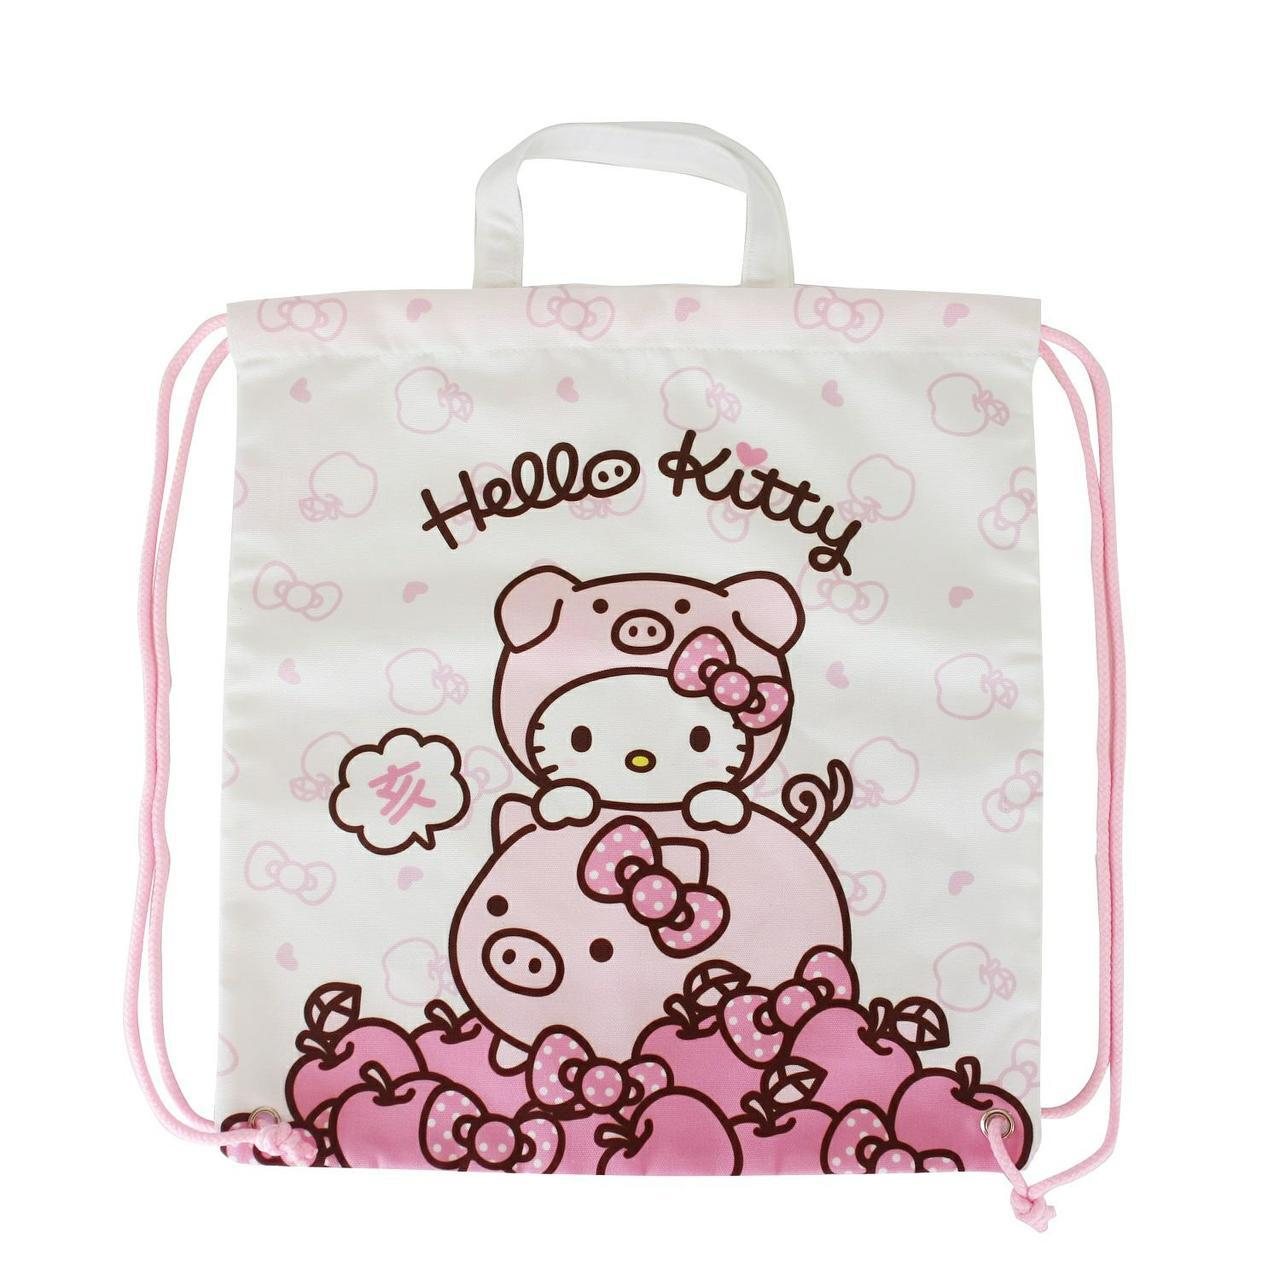 299元福袋外裝是Hello Kitty後背束口袋。 圖/7-ELEVEN提供